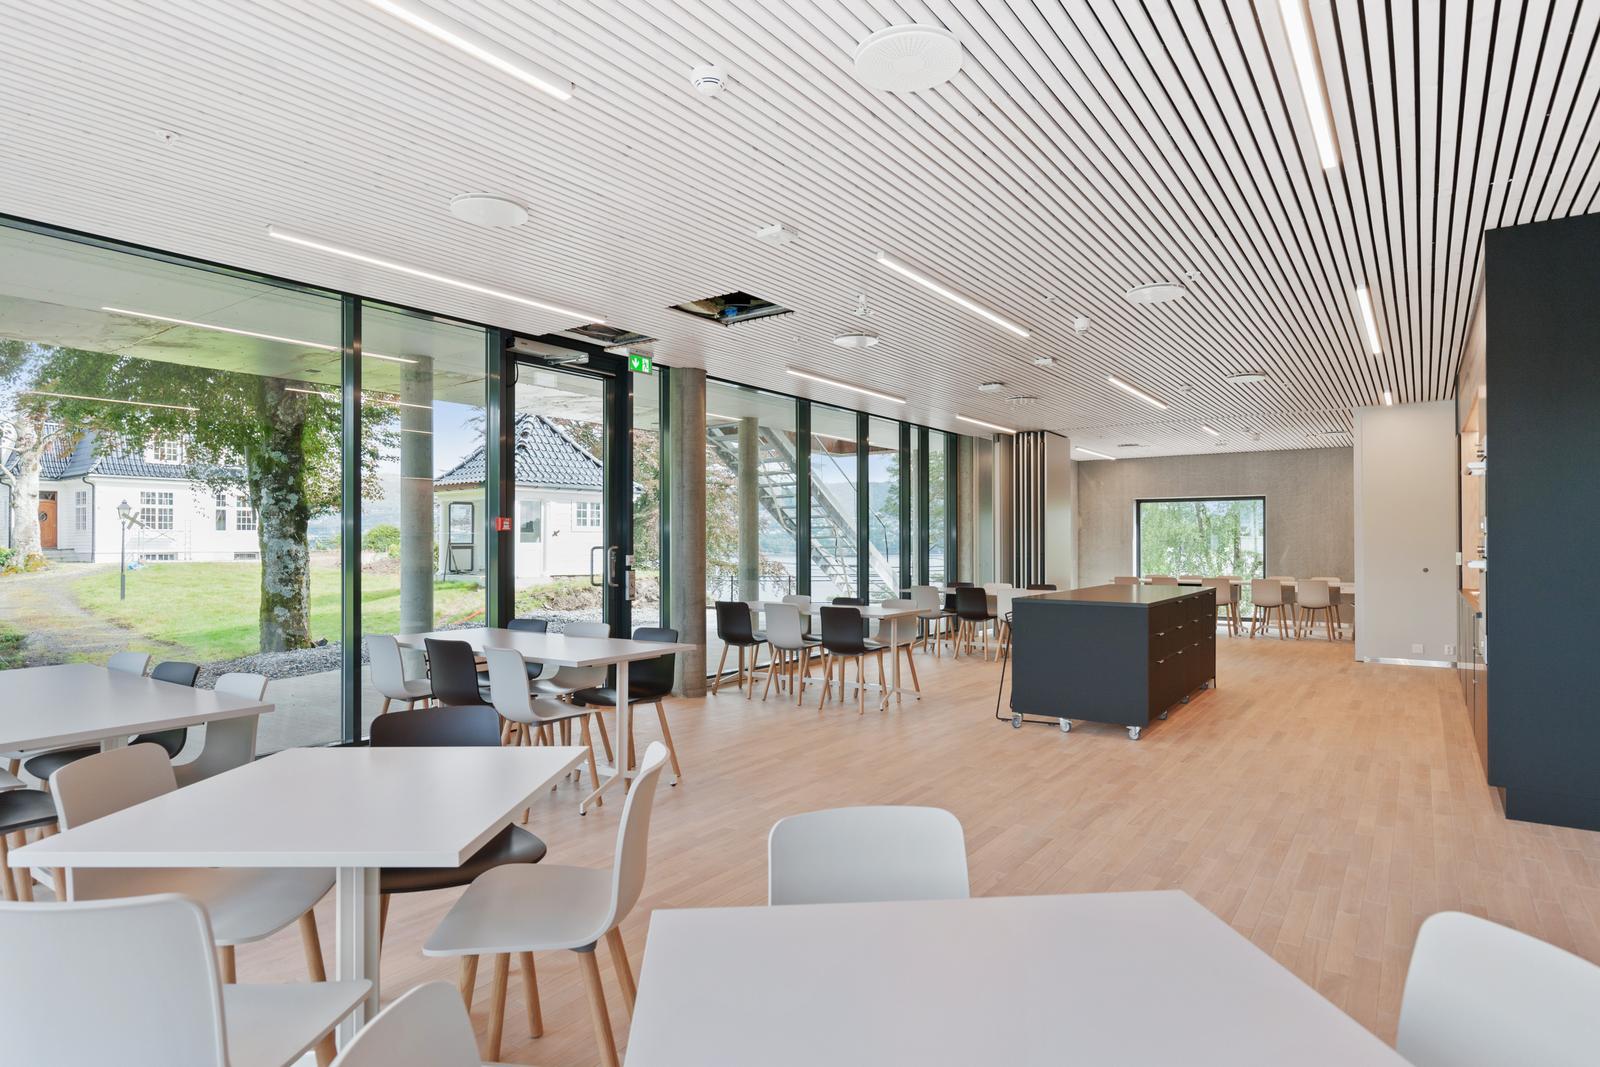 Belysning i spisesal hos Helse Bergen Distriktspsykiatriske senter